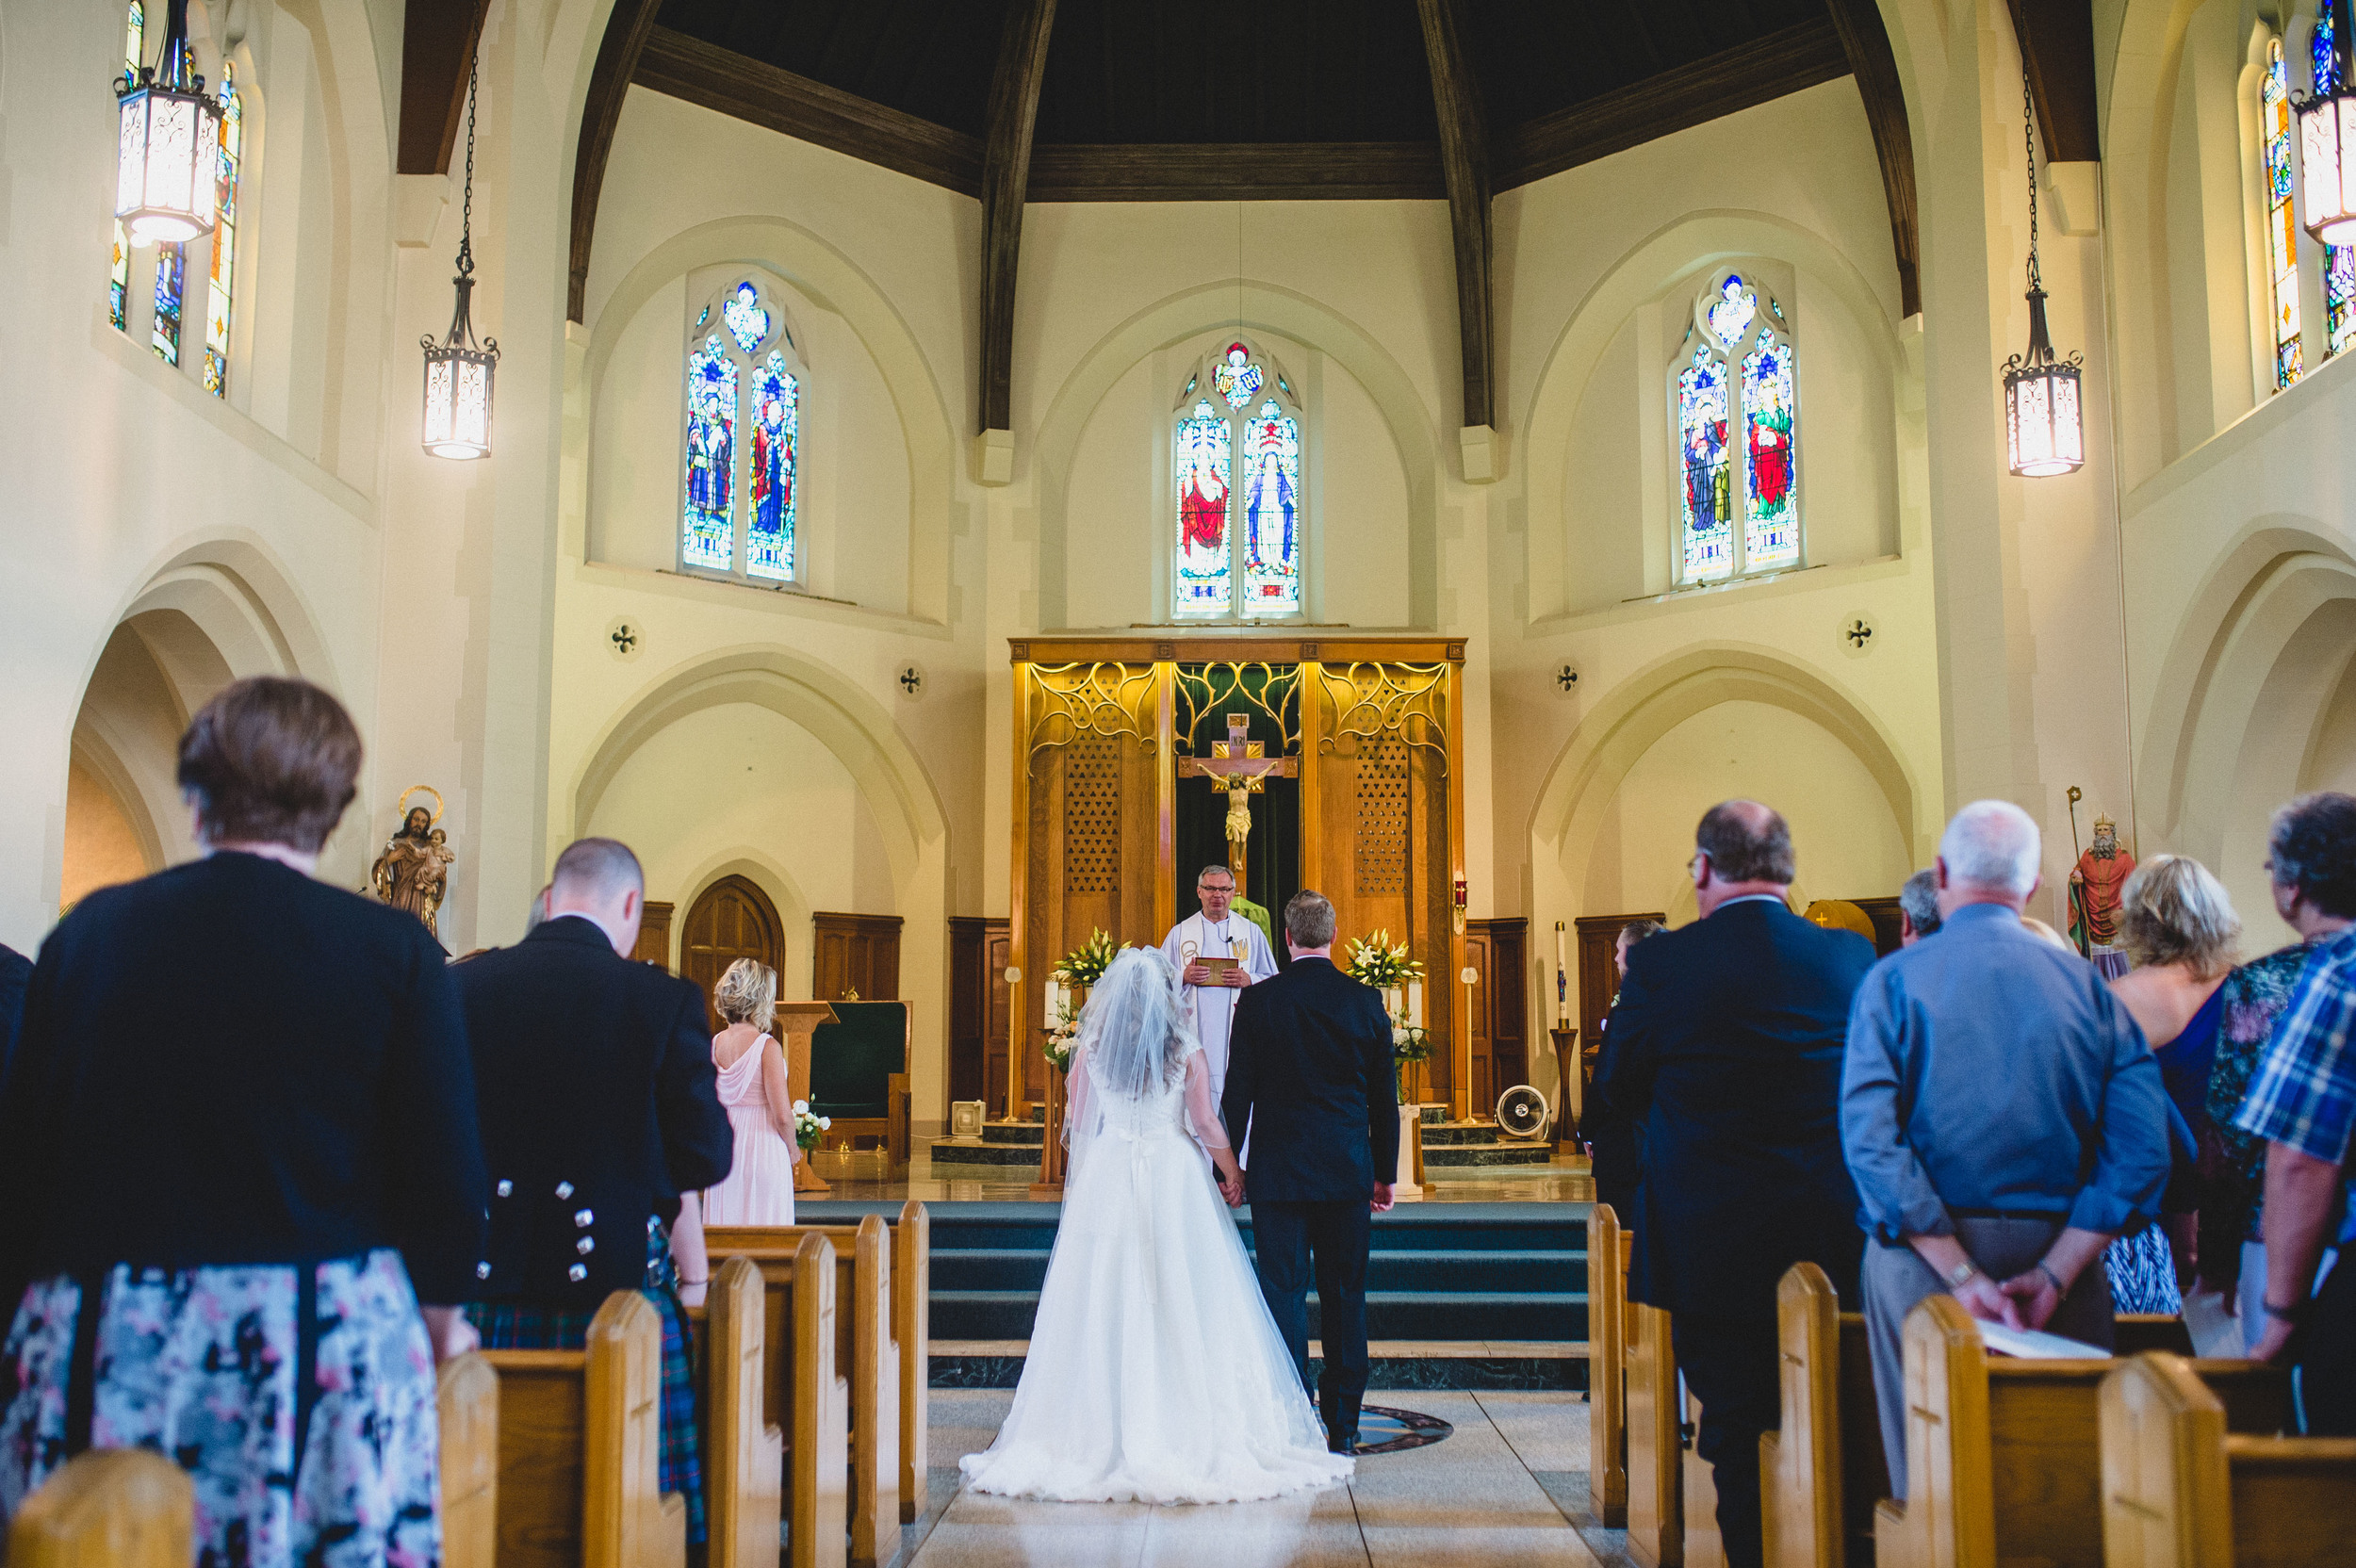 Vancouver St Augustine 's Church wedding photographer edward lai photography-36.jpg